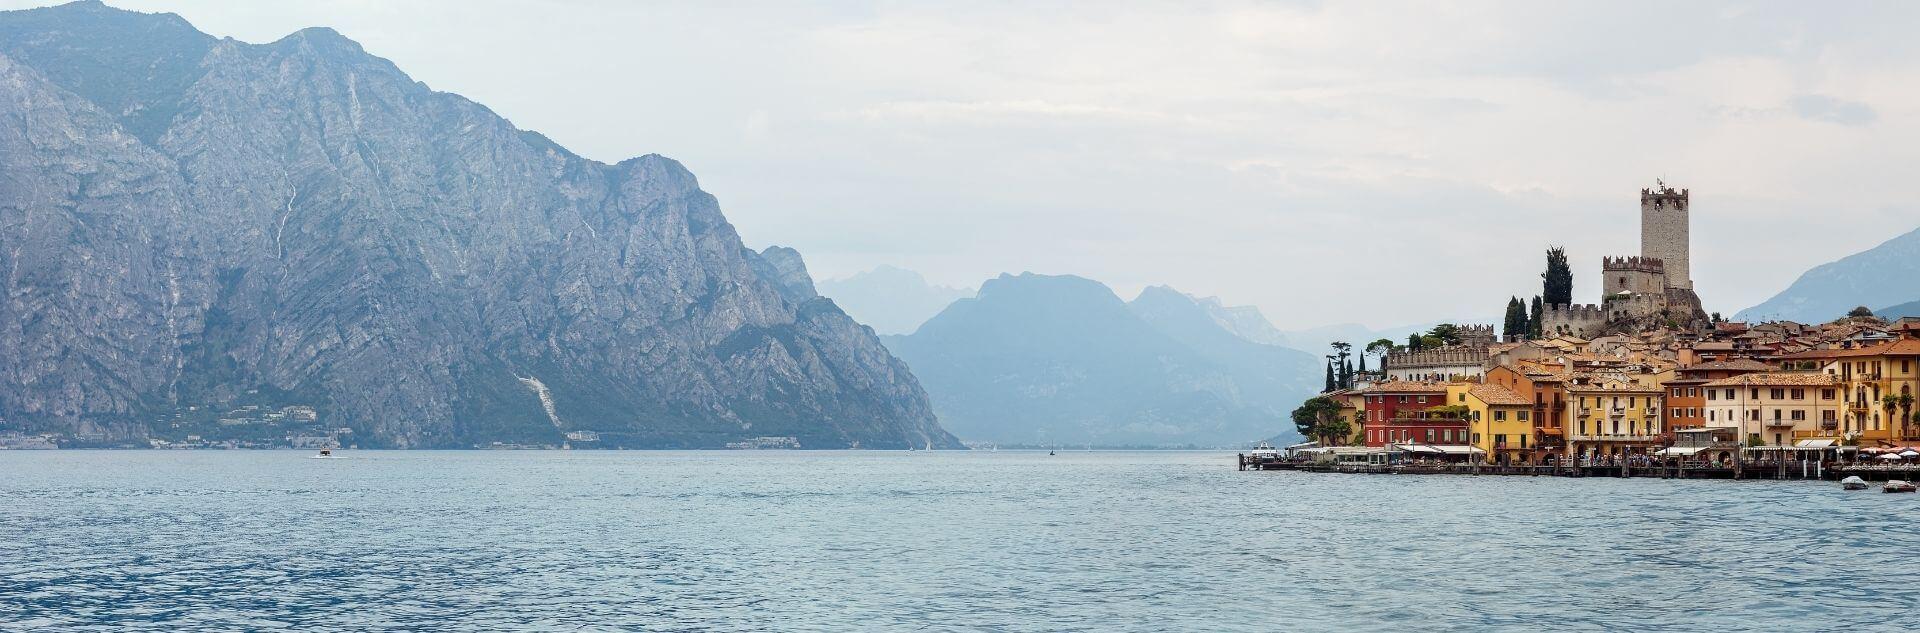 Panorama Malcesine Gardasee Italien